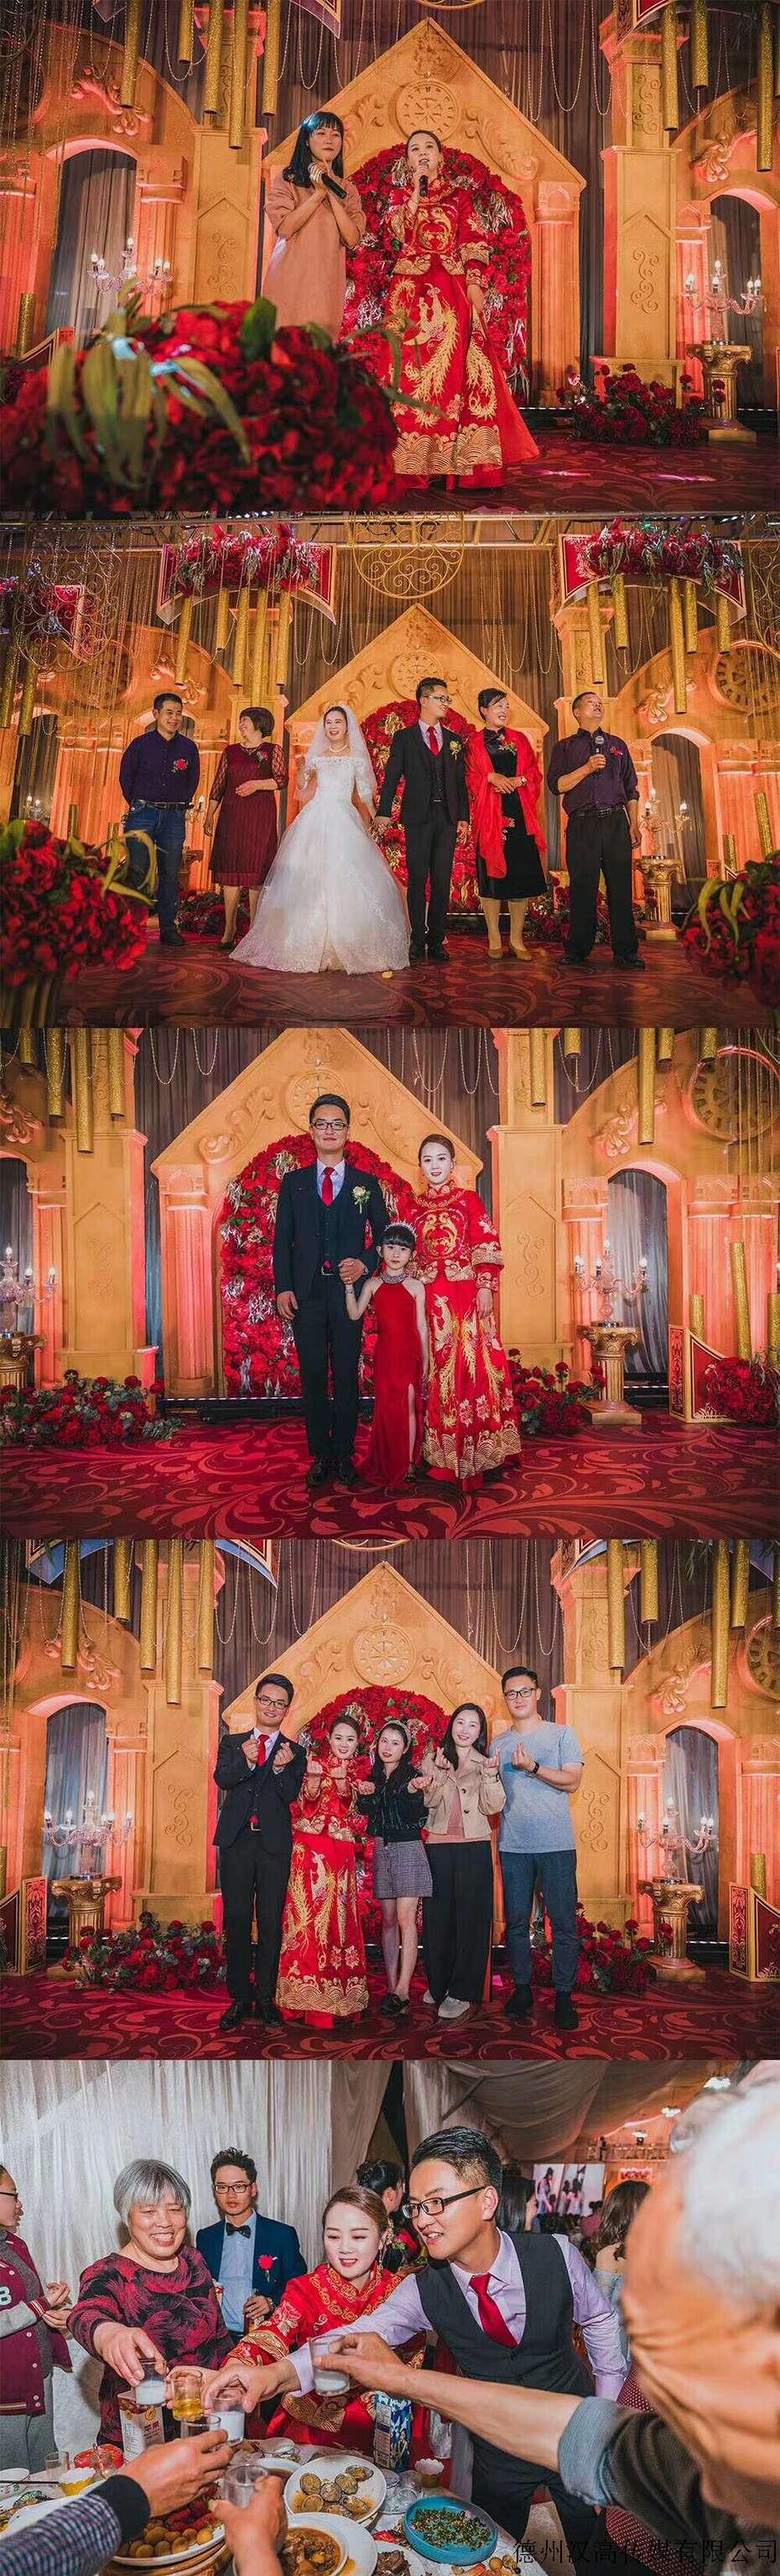 婚禮8.jpg